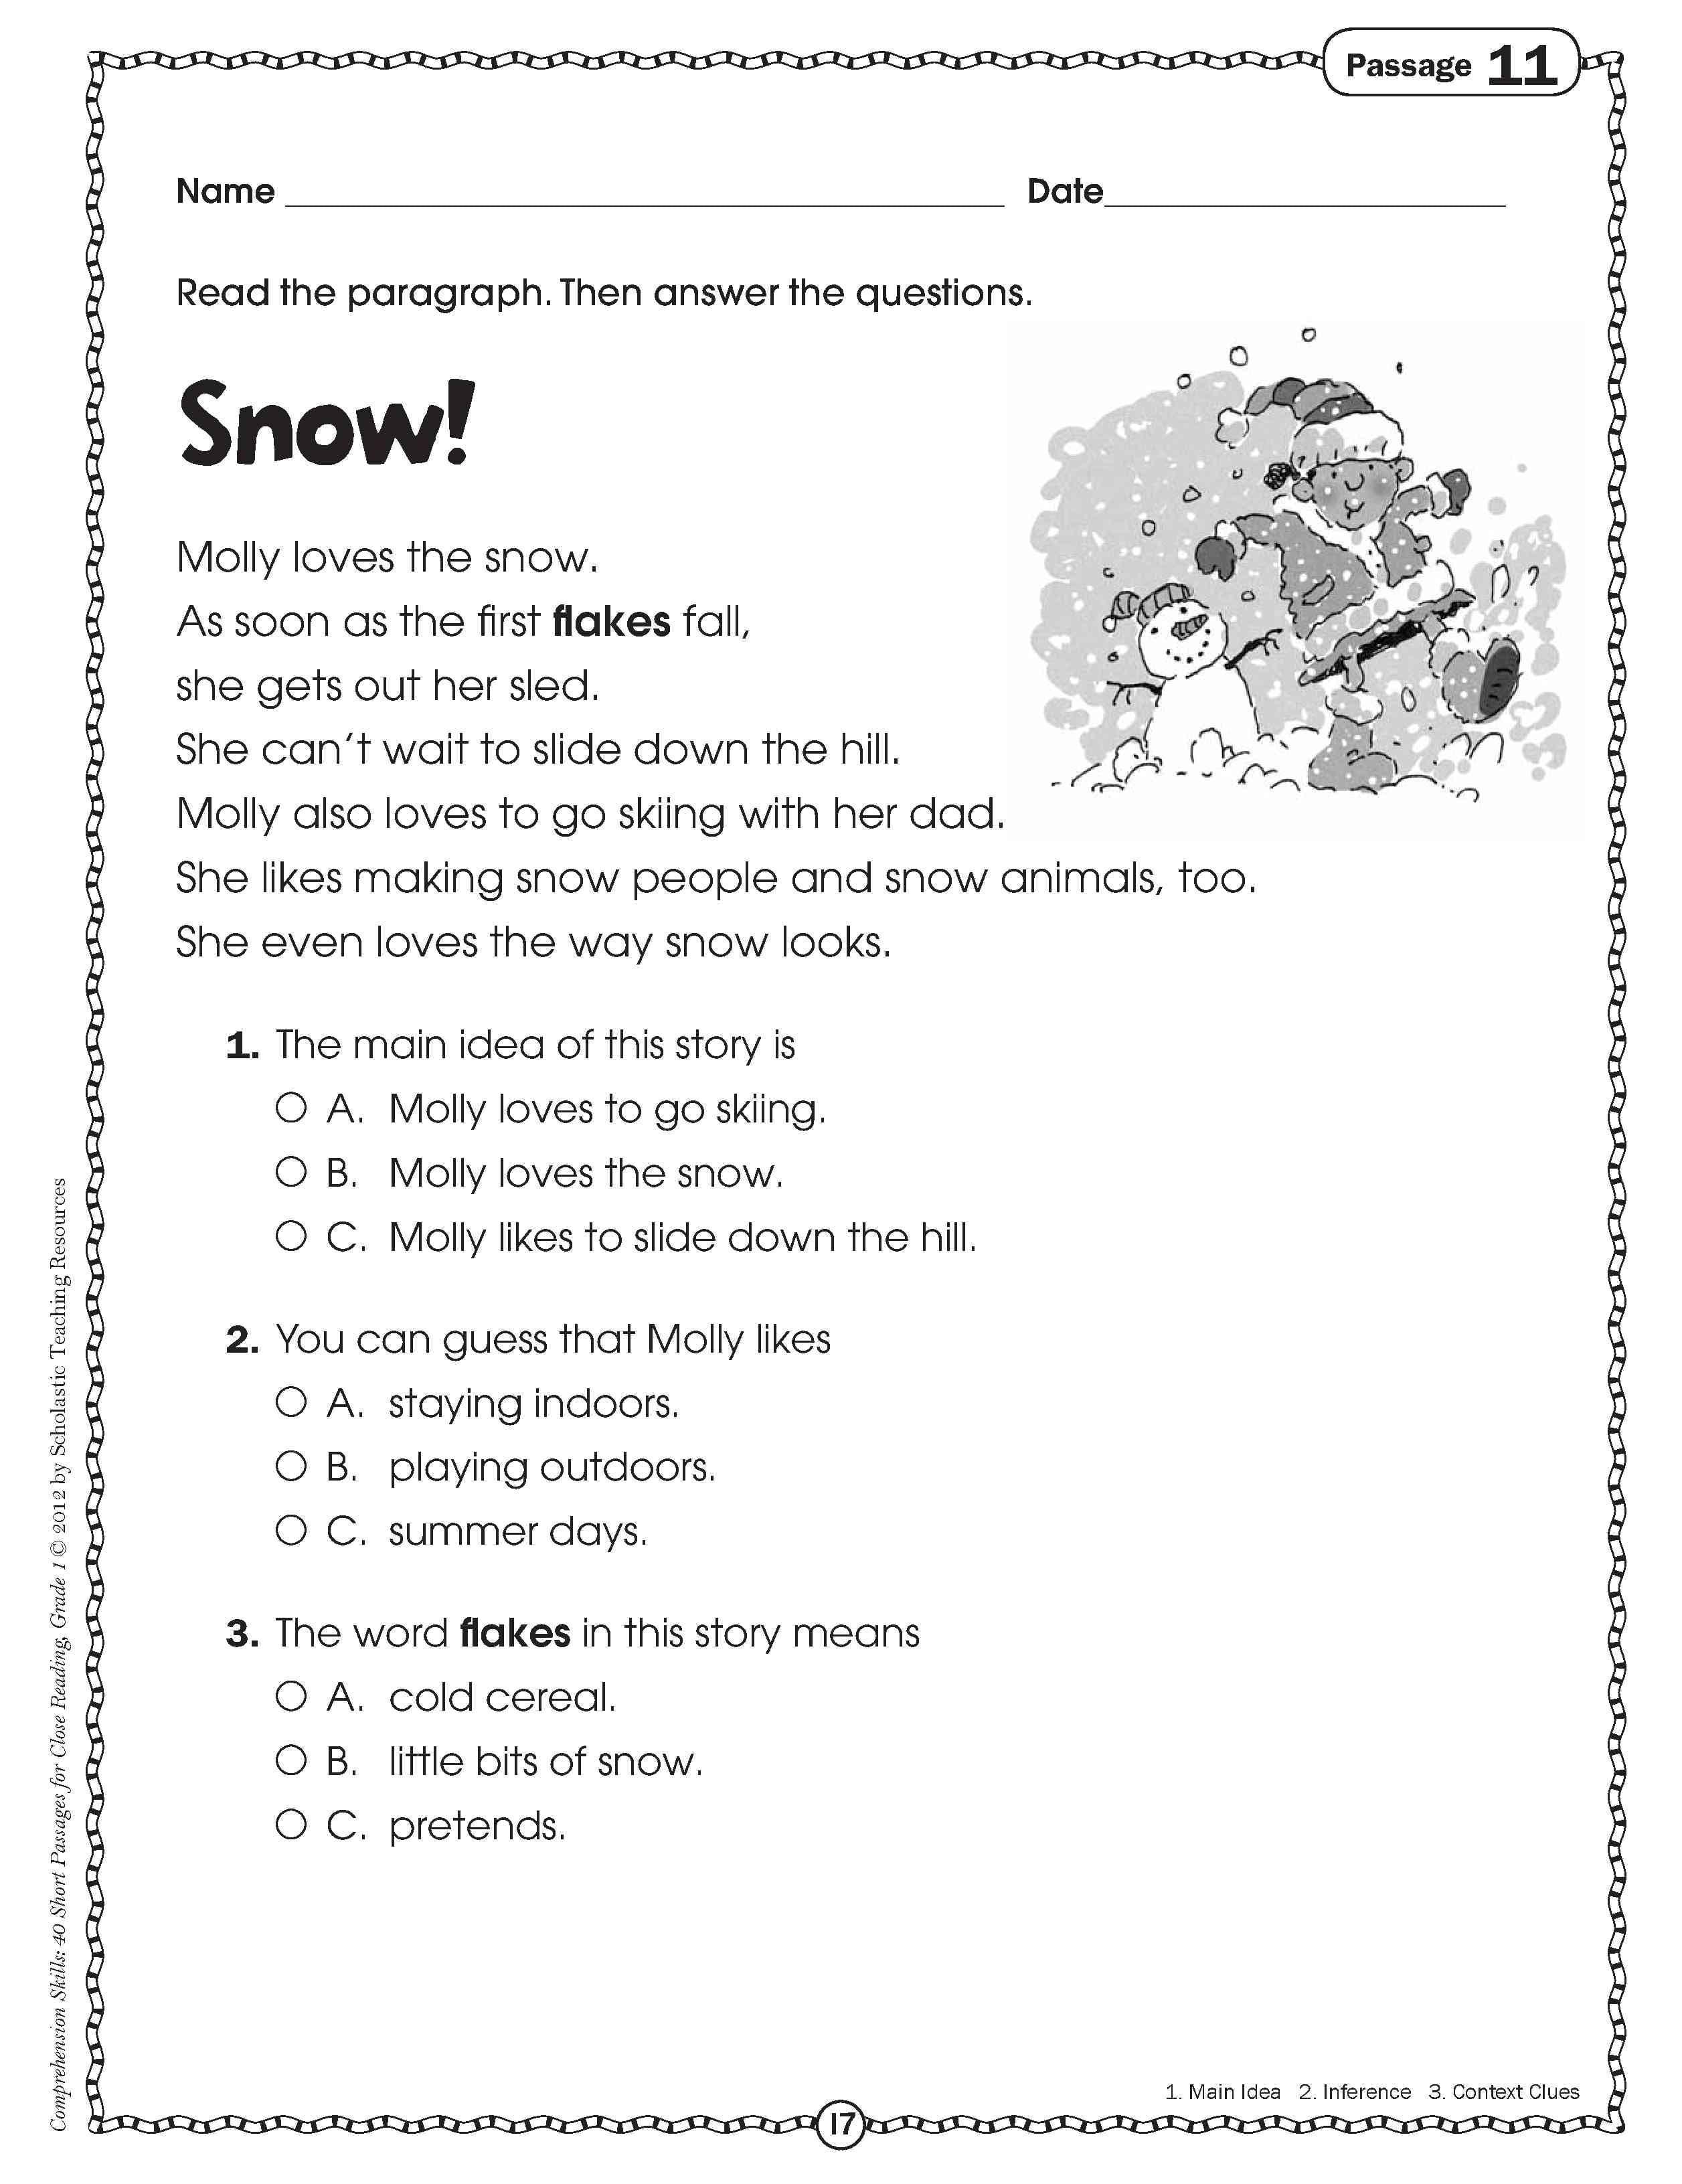 Kindergarten Free Reading Comprehension Passages Math Games